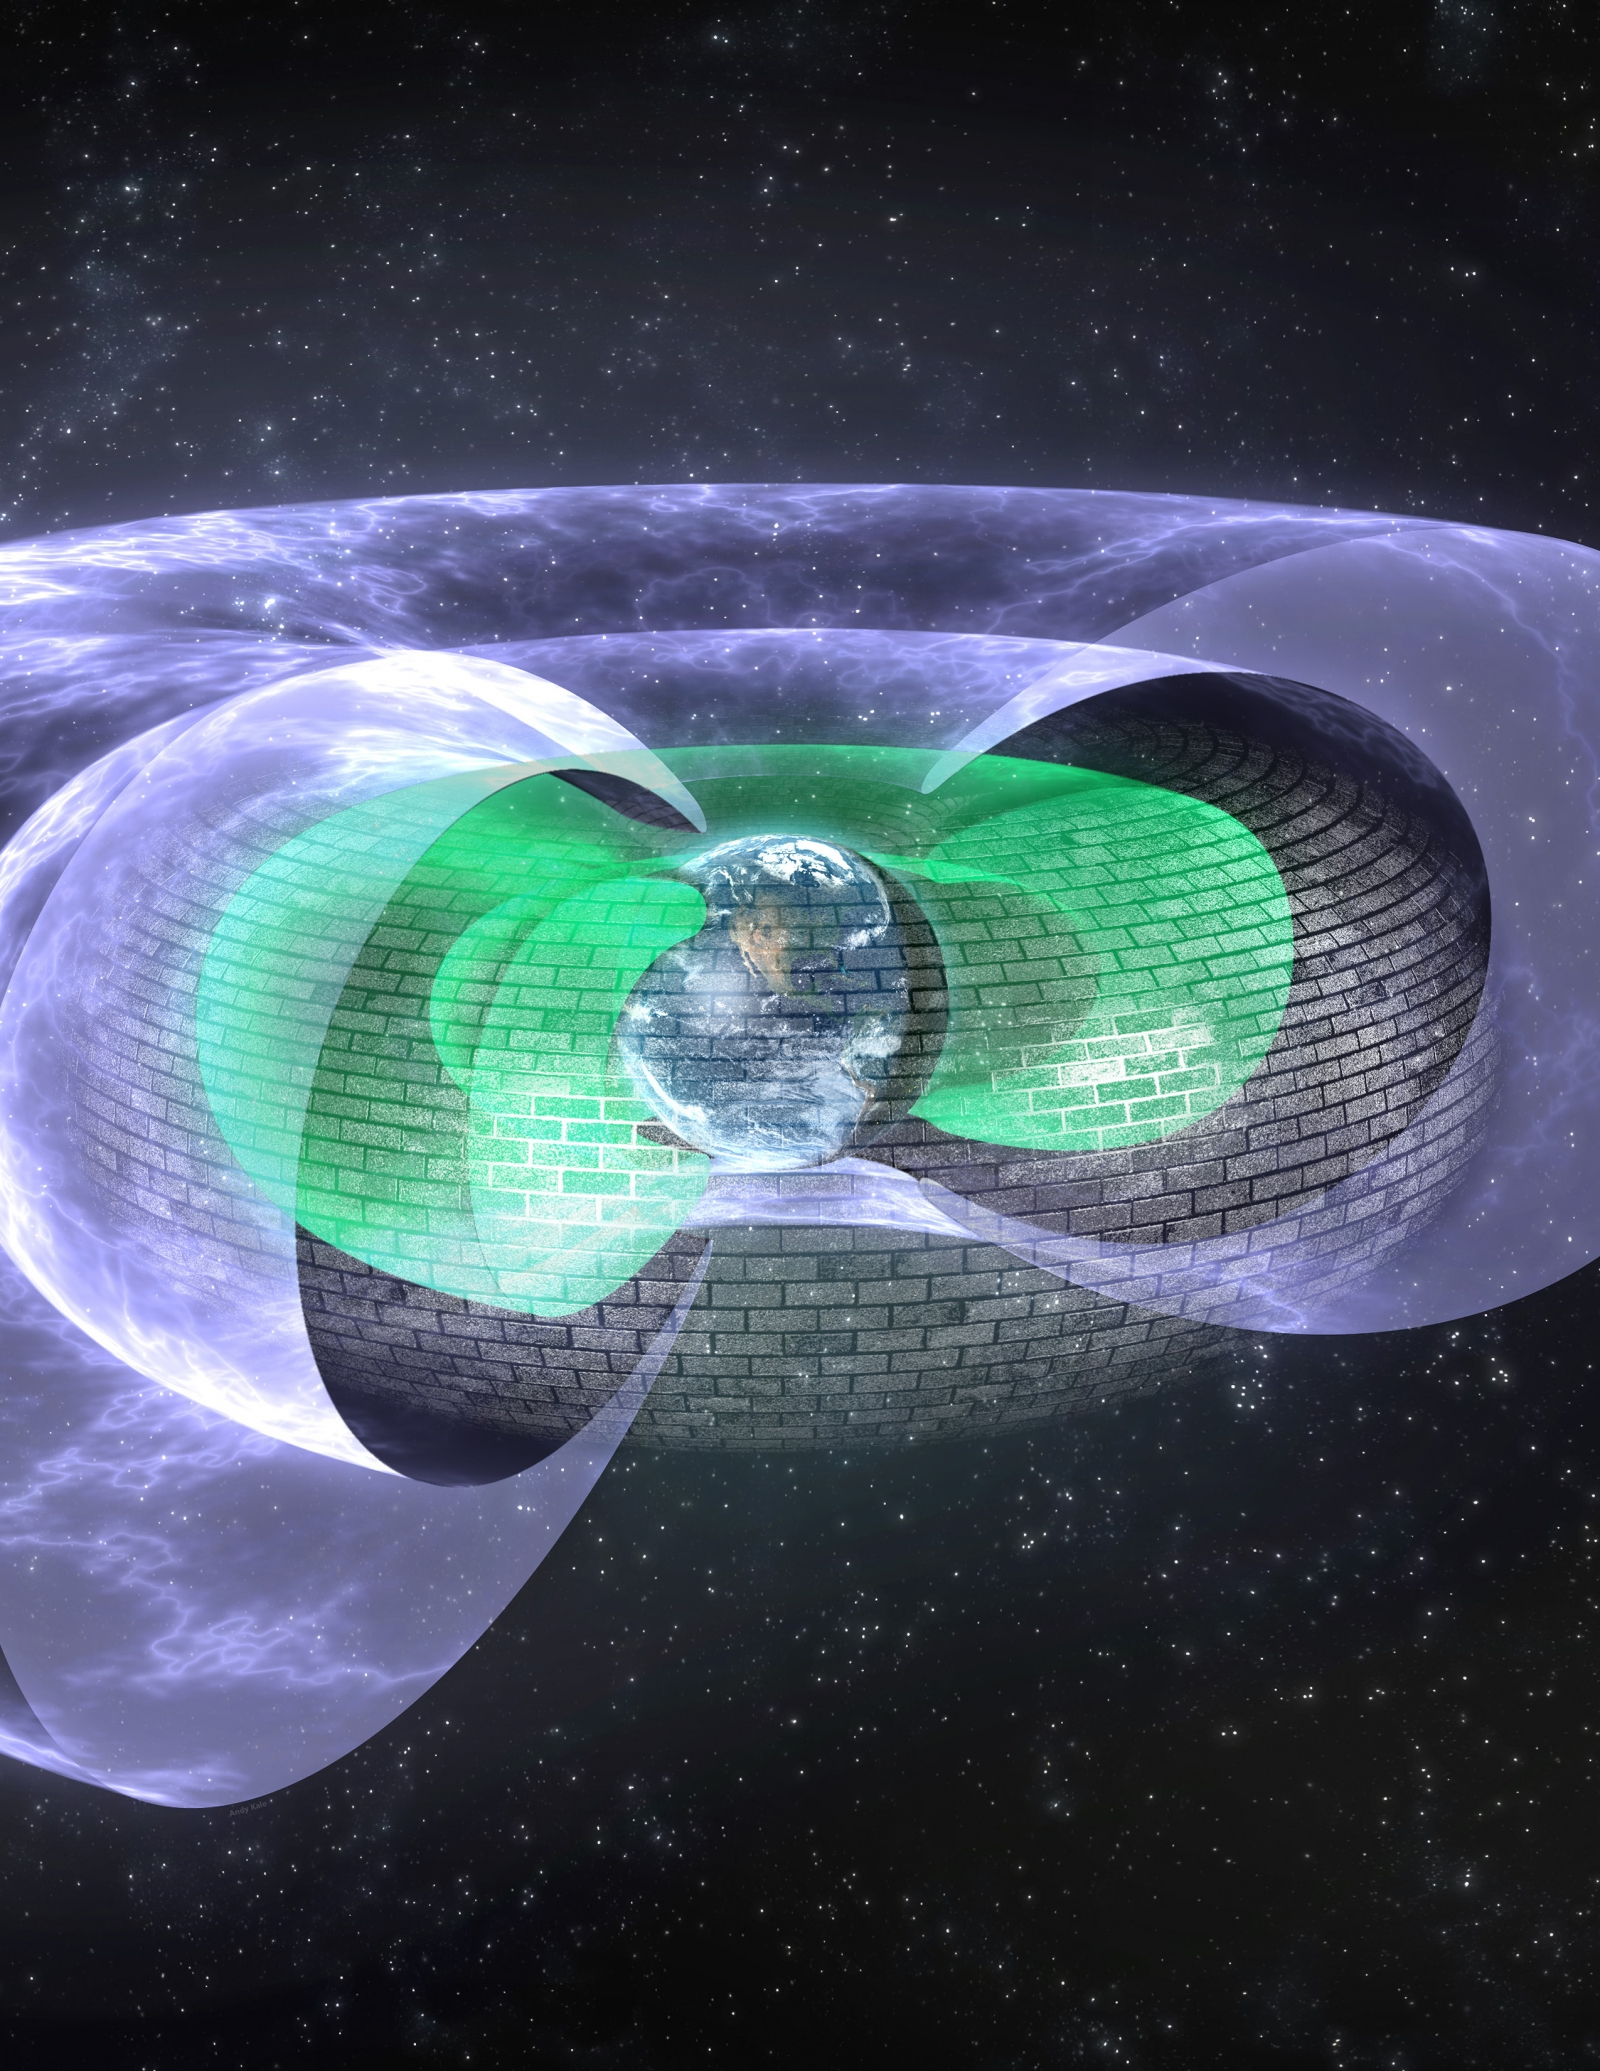 star trek force field